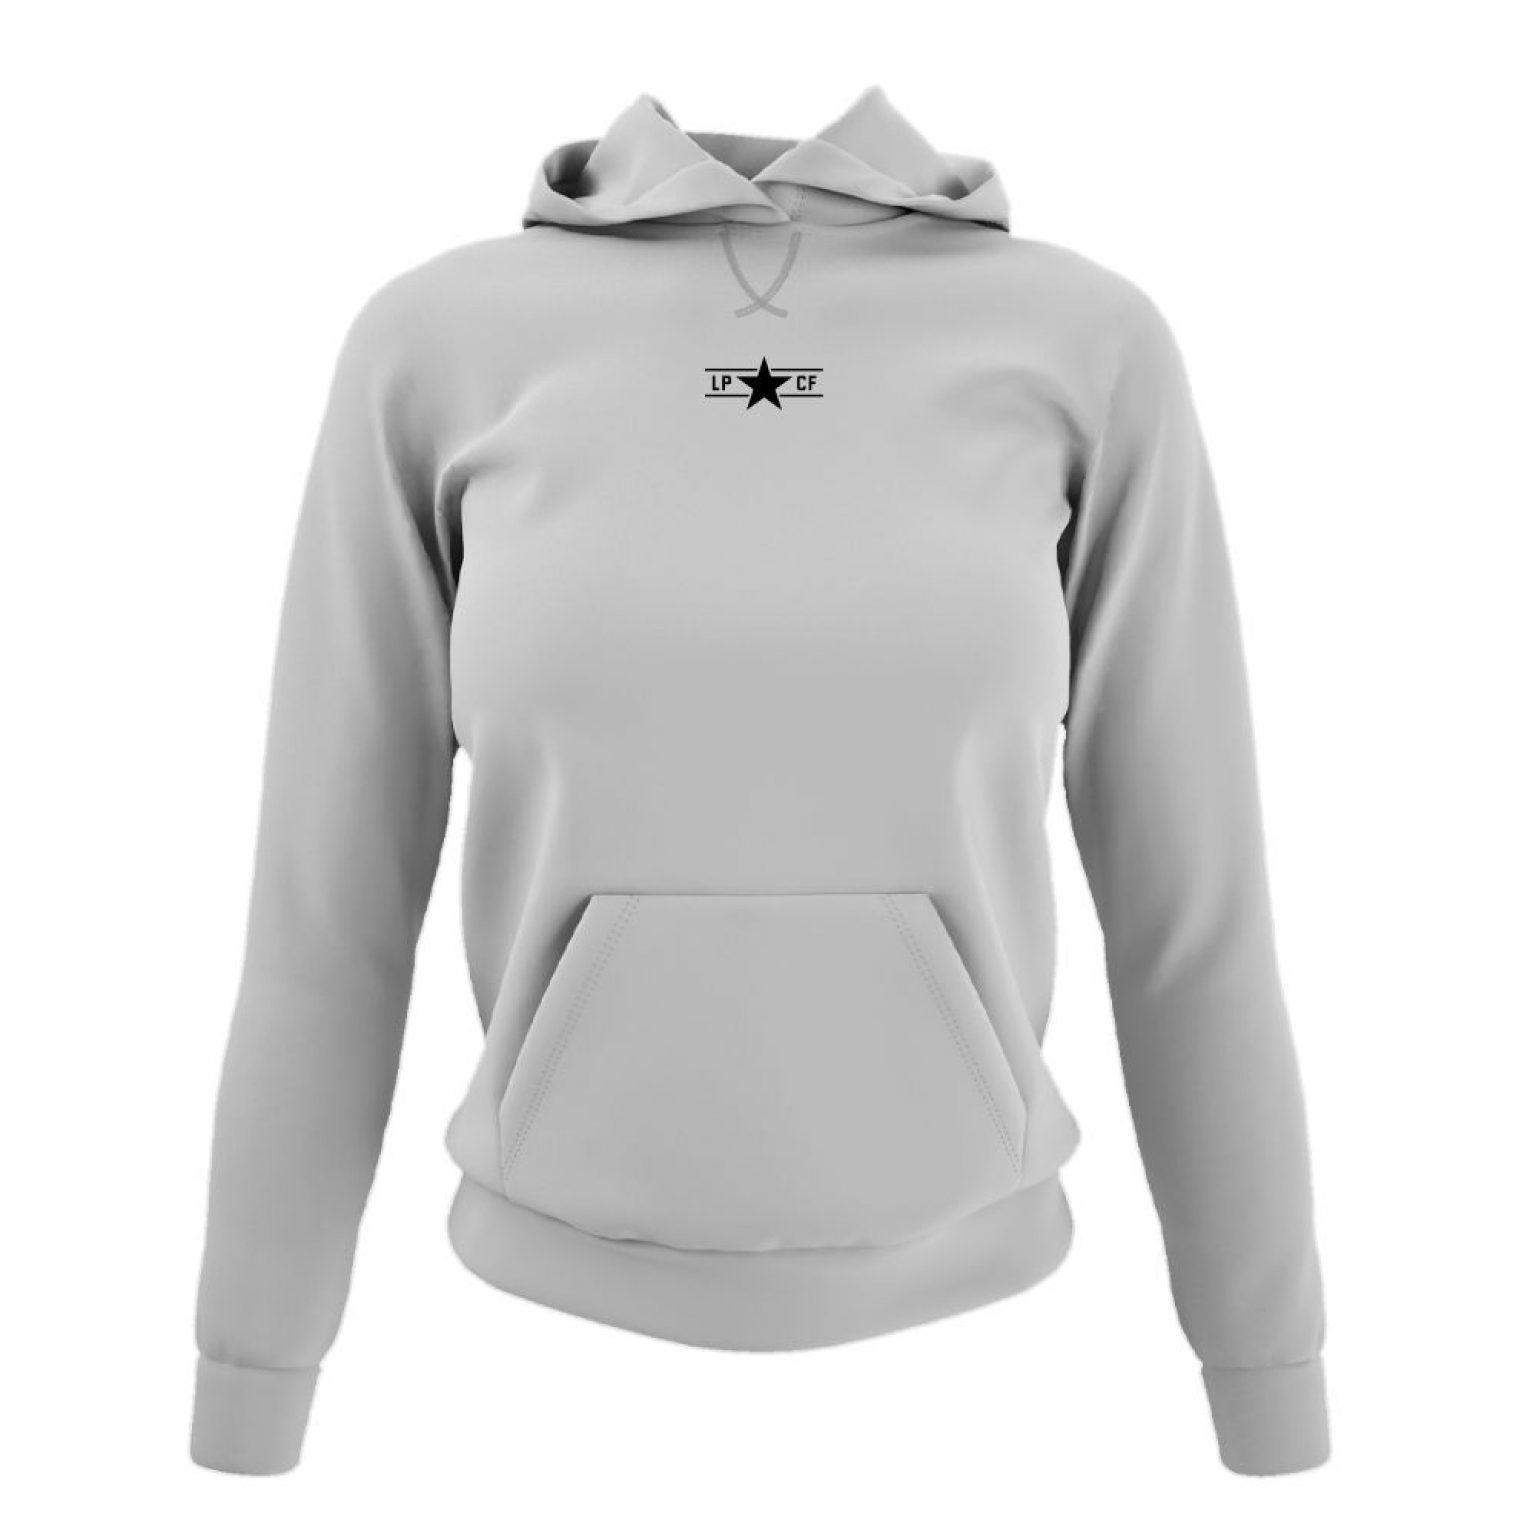 LPcircle hoodie damen oxford front